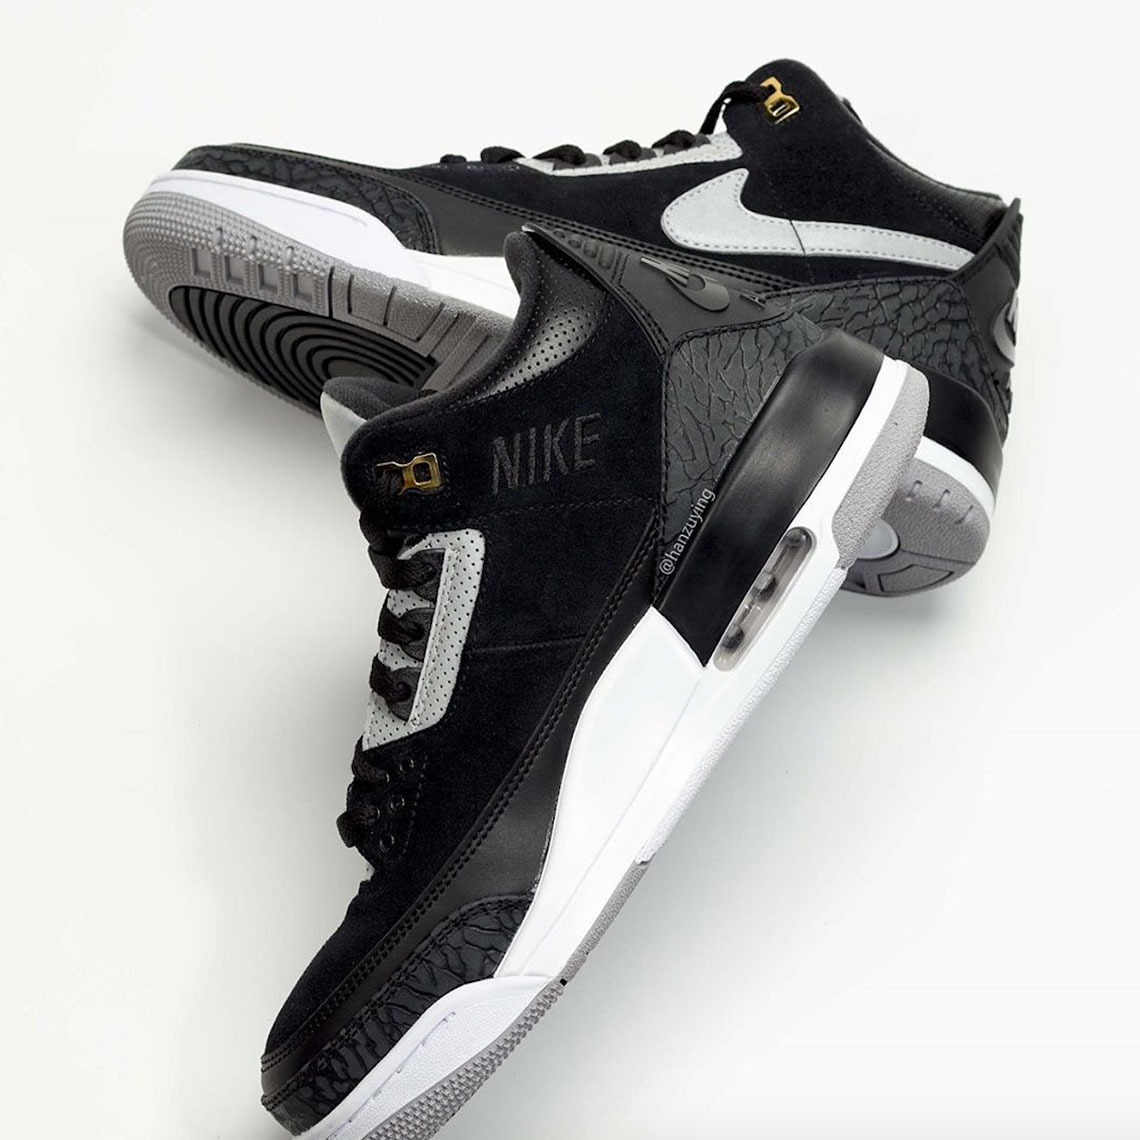 uk availability 34ddf 29b5f Air Jordan 3 Tinker Black Cement Grey Gold CK4348-007   SneakerNews.com